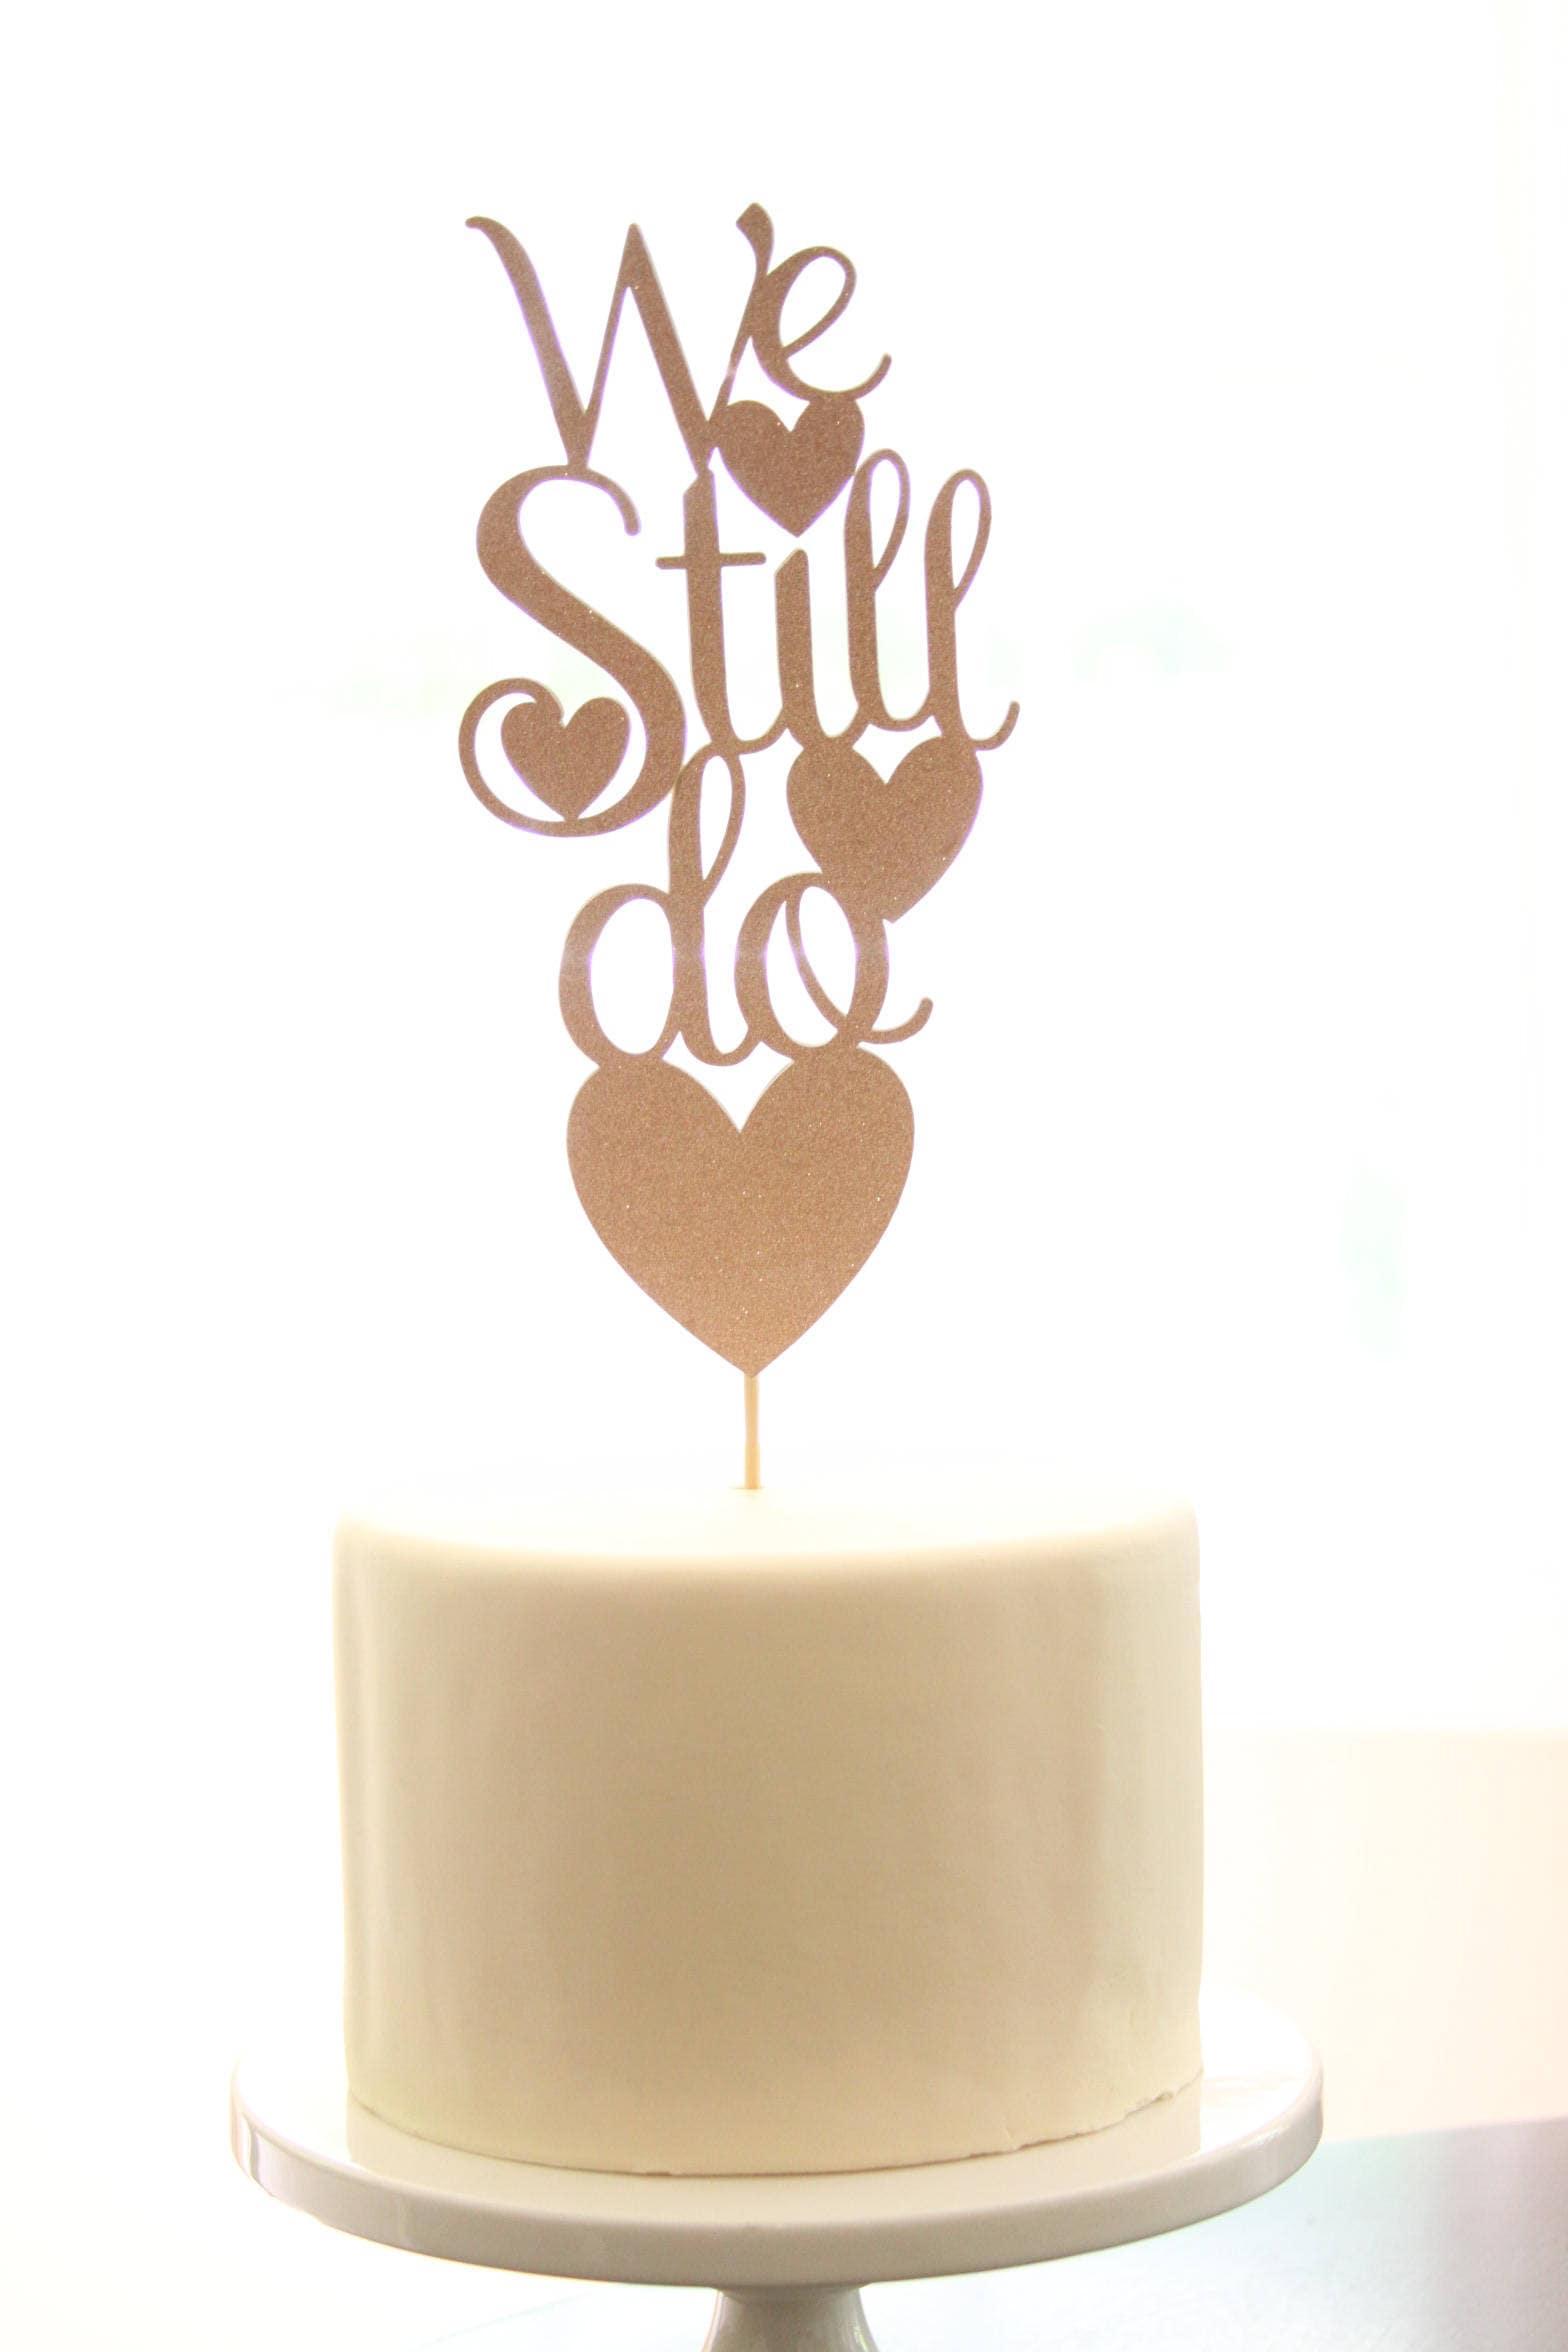 We Still Do, Wedding Anniversary Cake Topper, Rose Gold, Vow Renewal ...